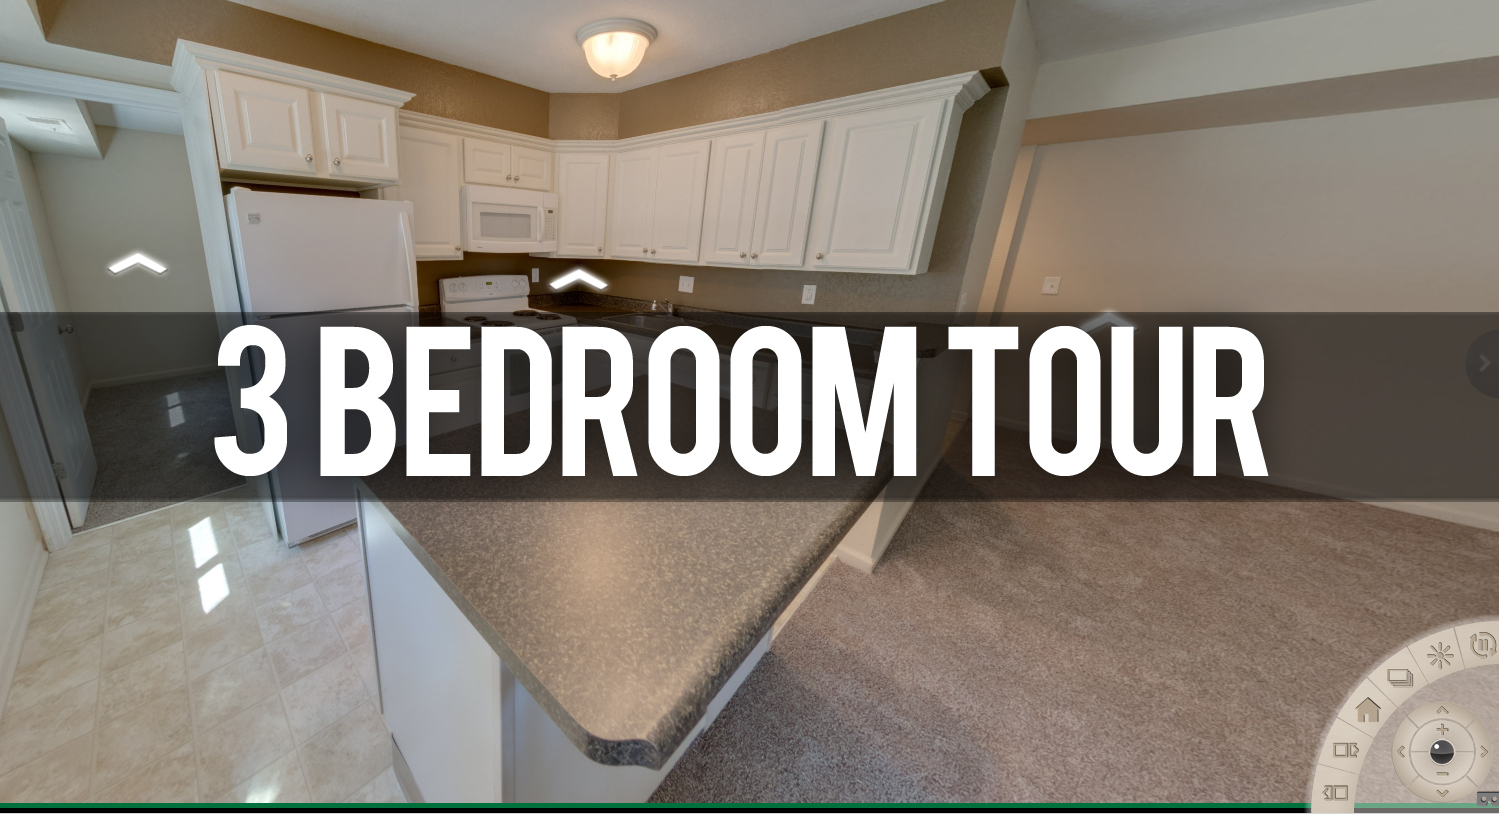 3 Bedroom Tour at Glenwood Apartments in East Lansing, MI